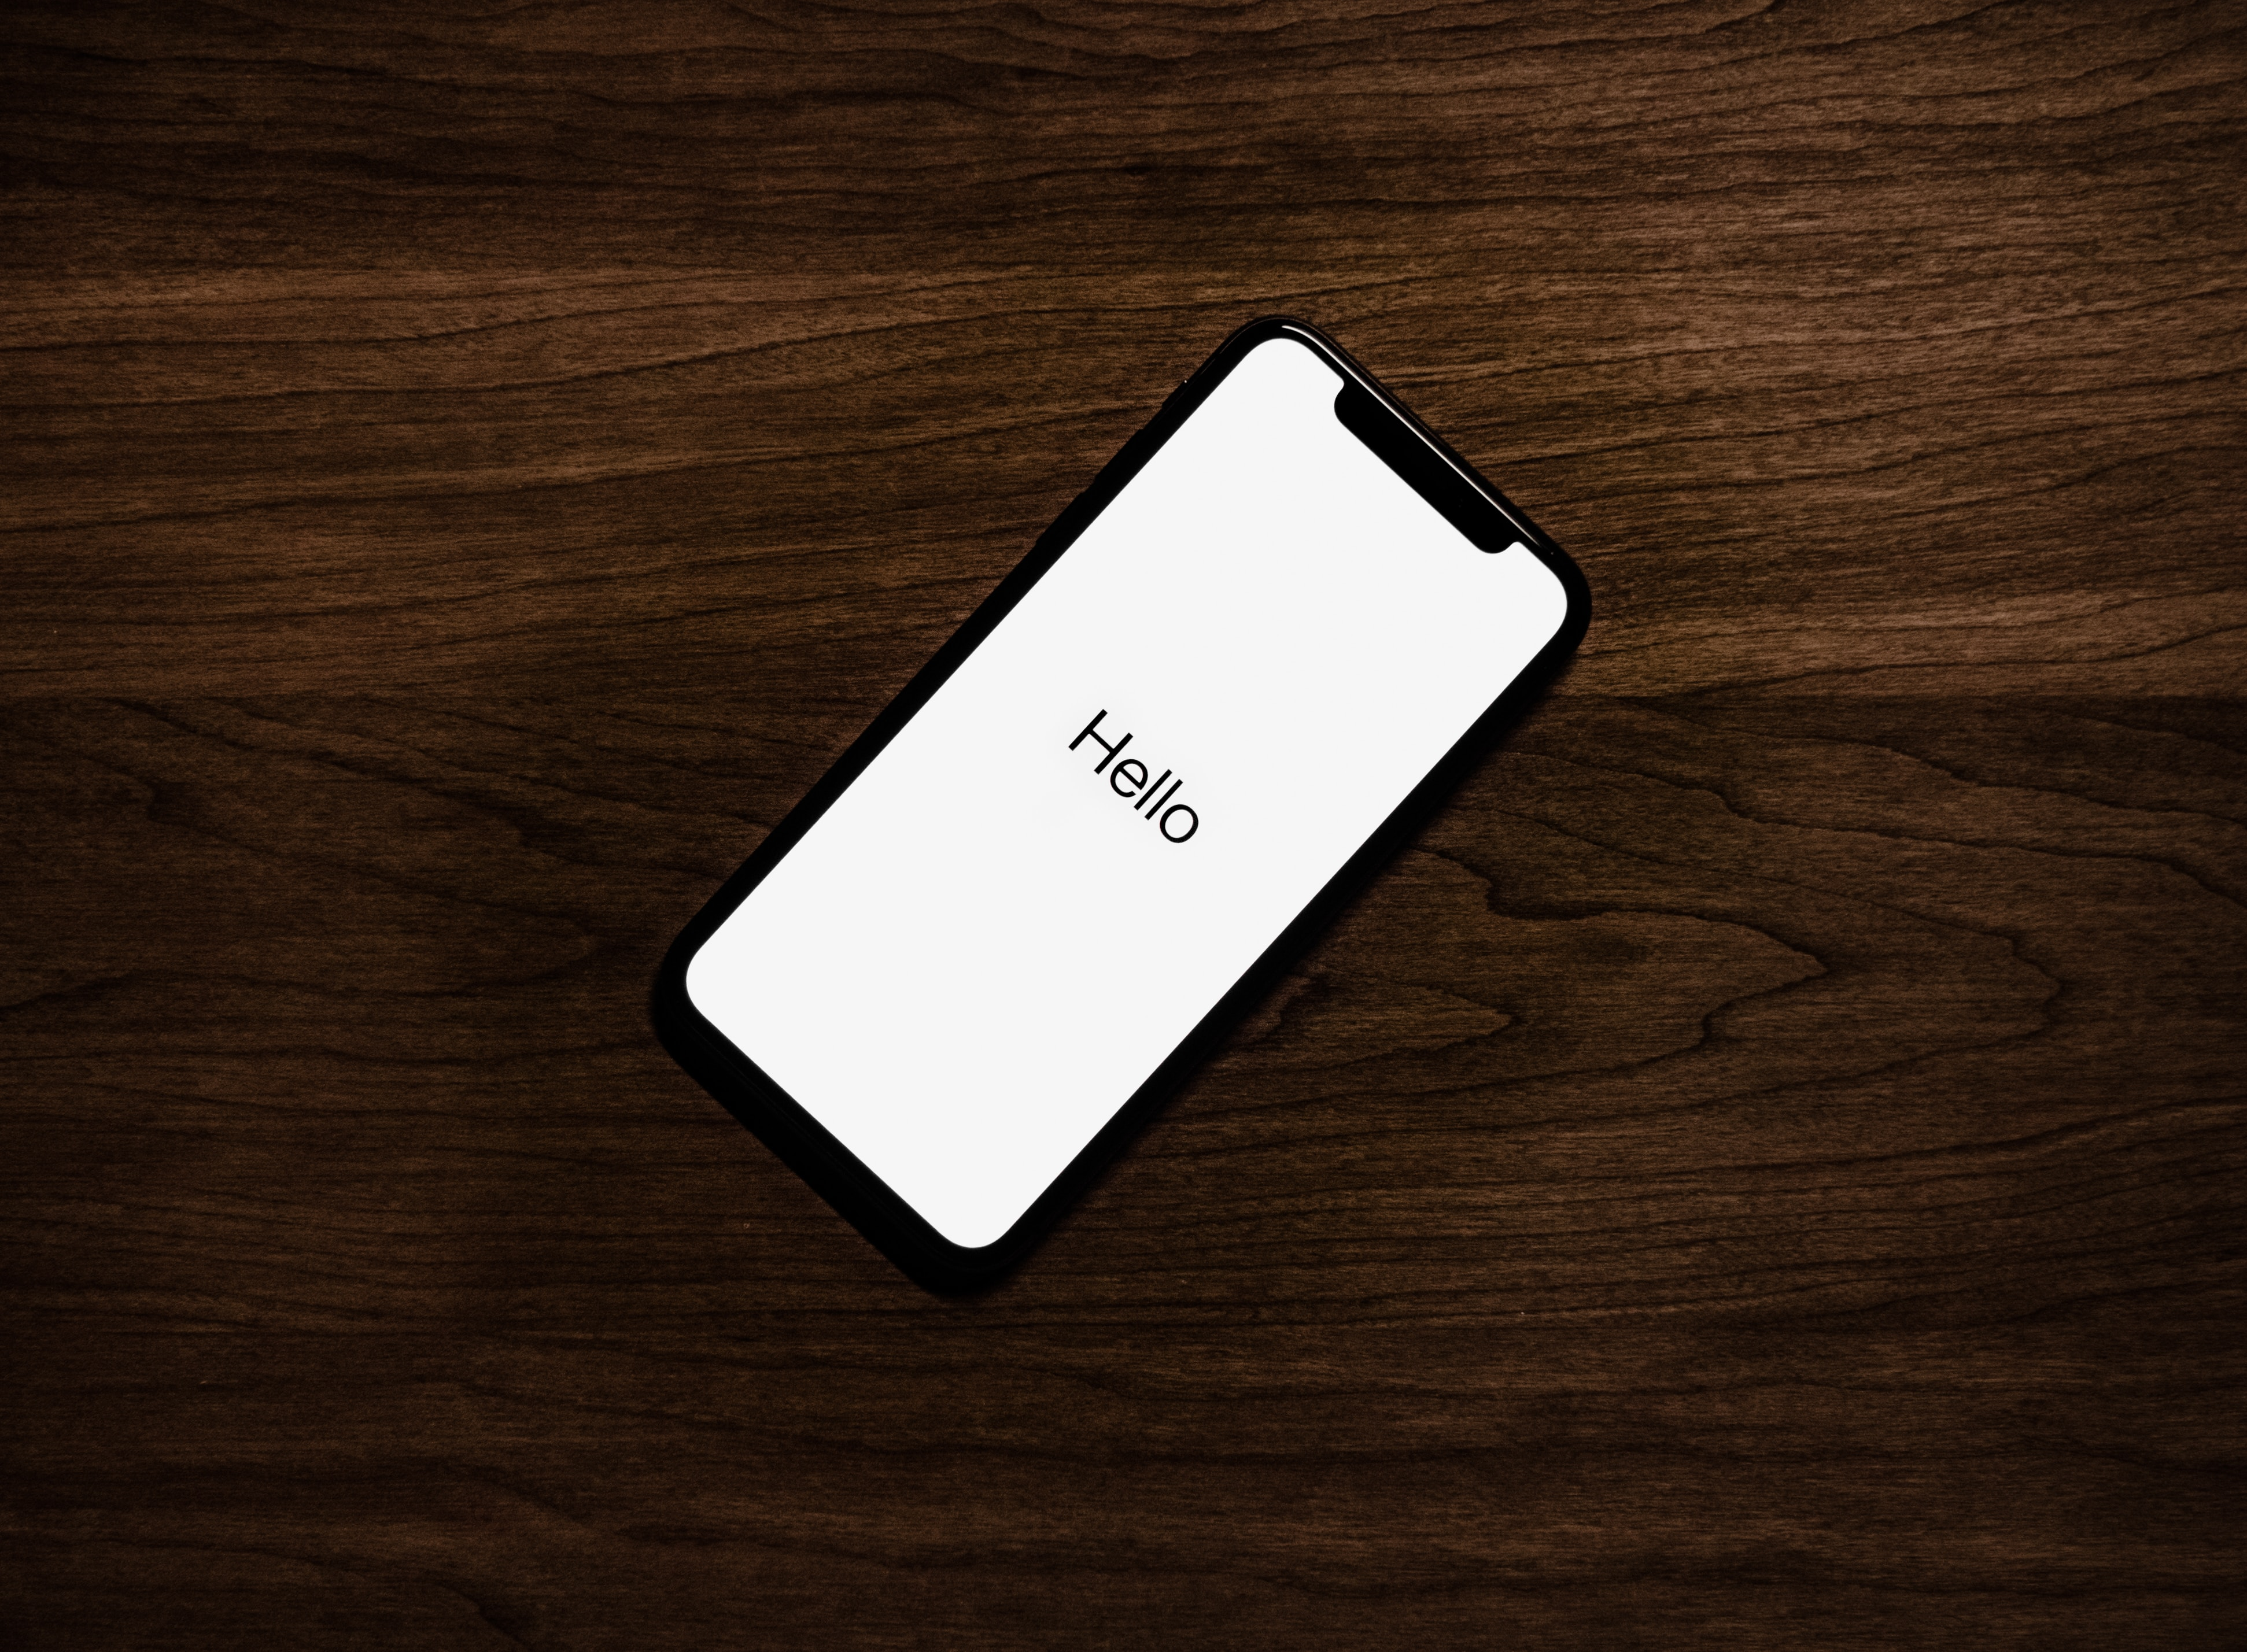 iPhoneはどれが良いか